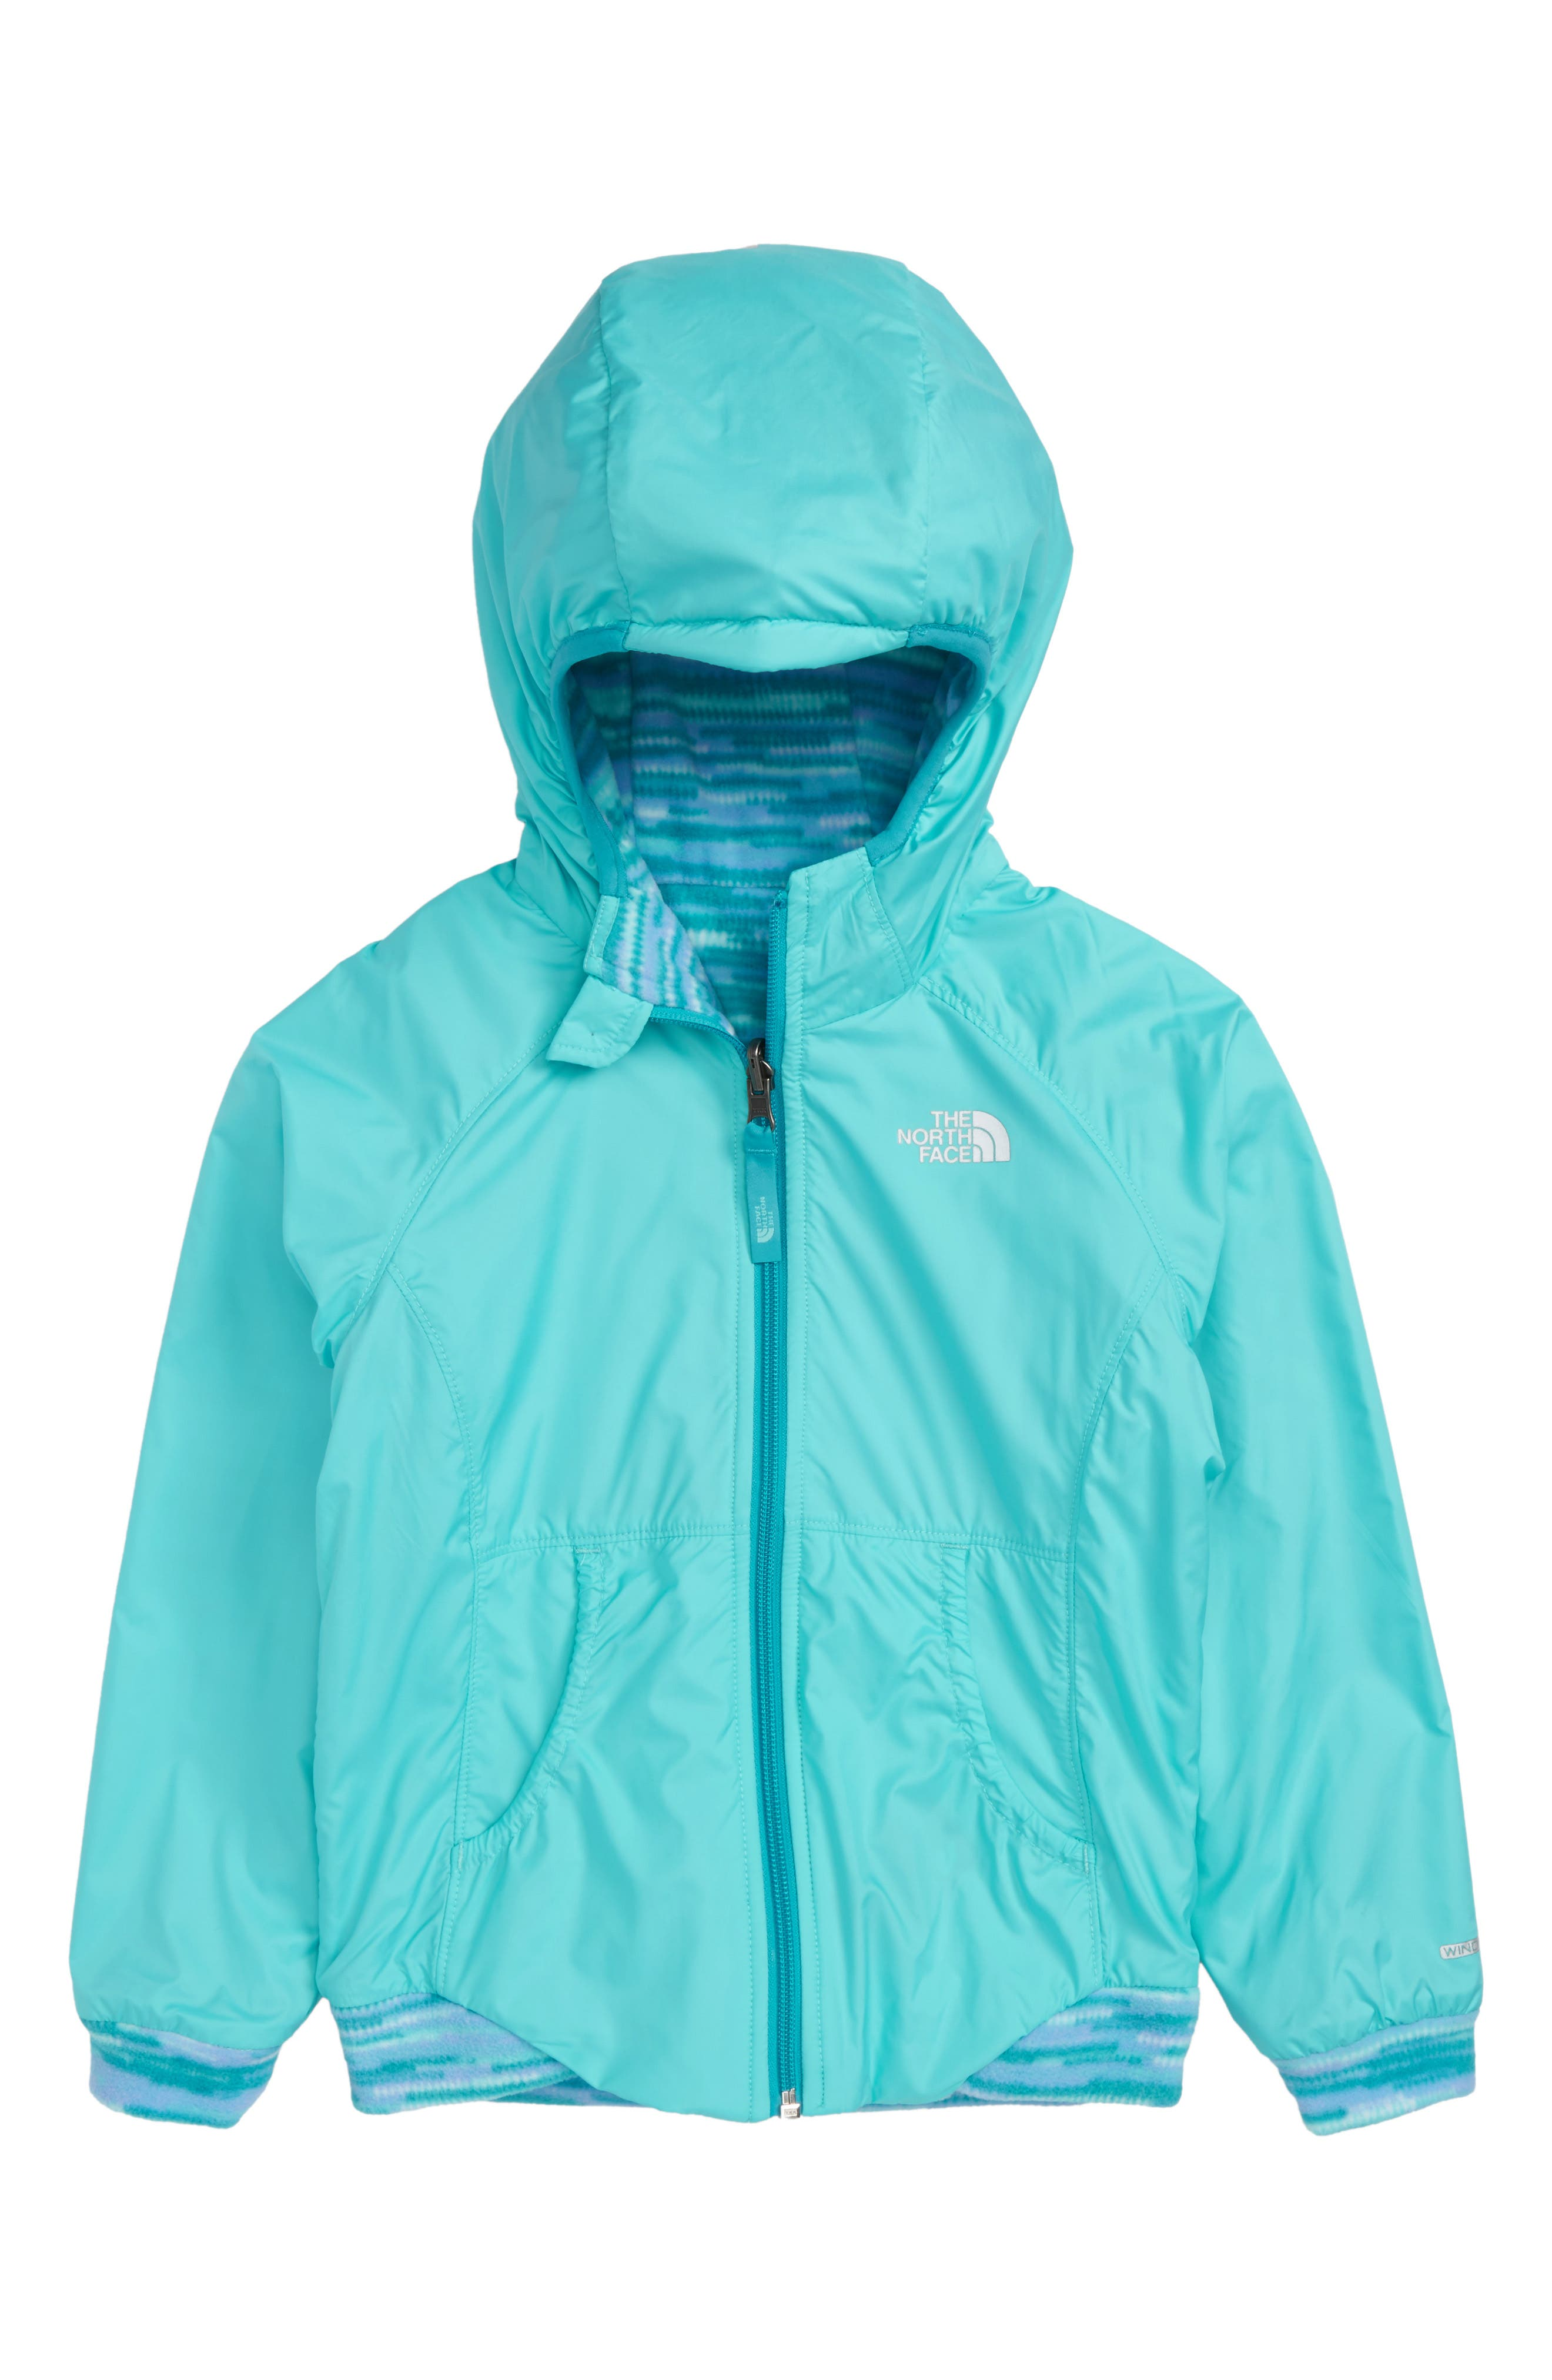 Breezeway Reversible Wind Jacket,                         Main,                         color, 400